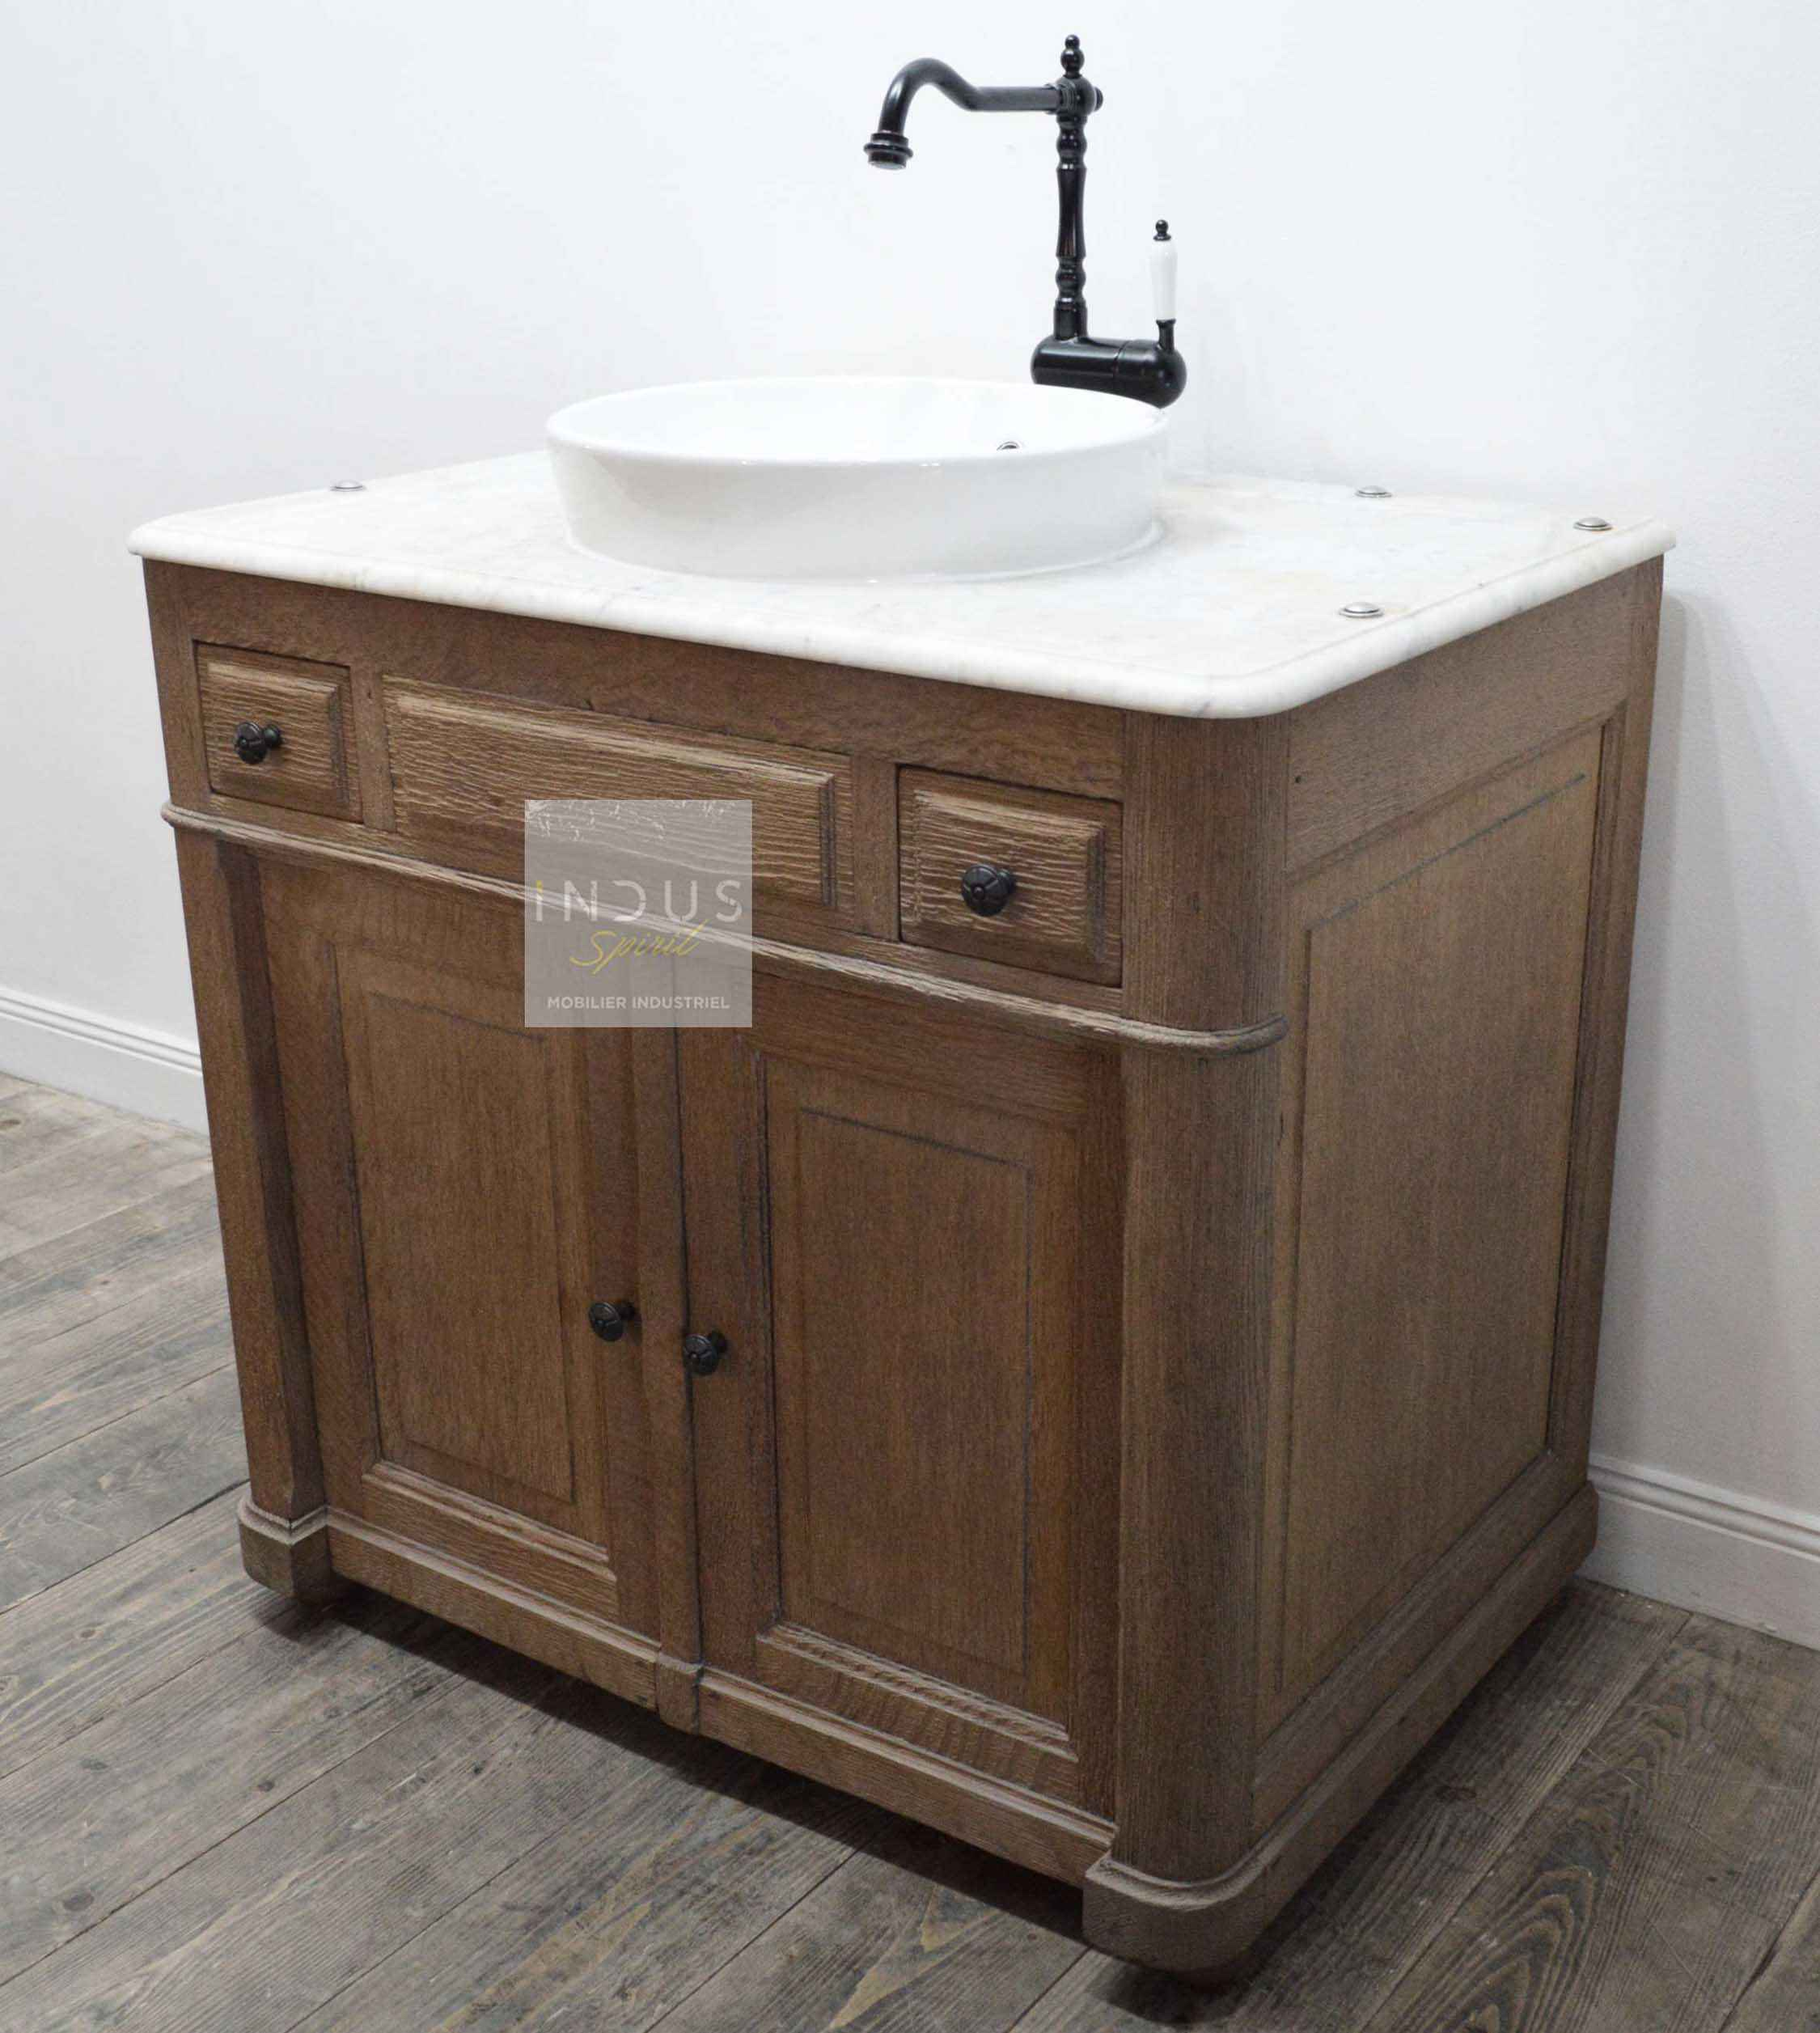 restauration-ancien-meuble-de-toilette.jpg